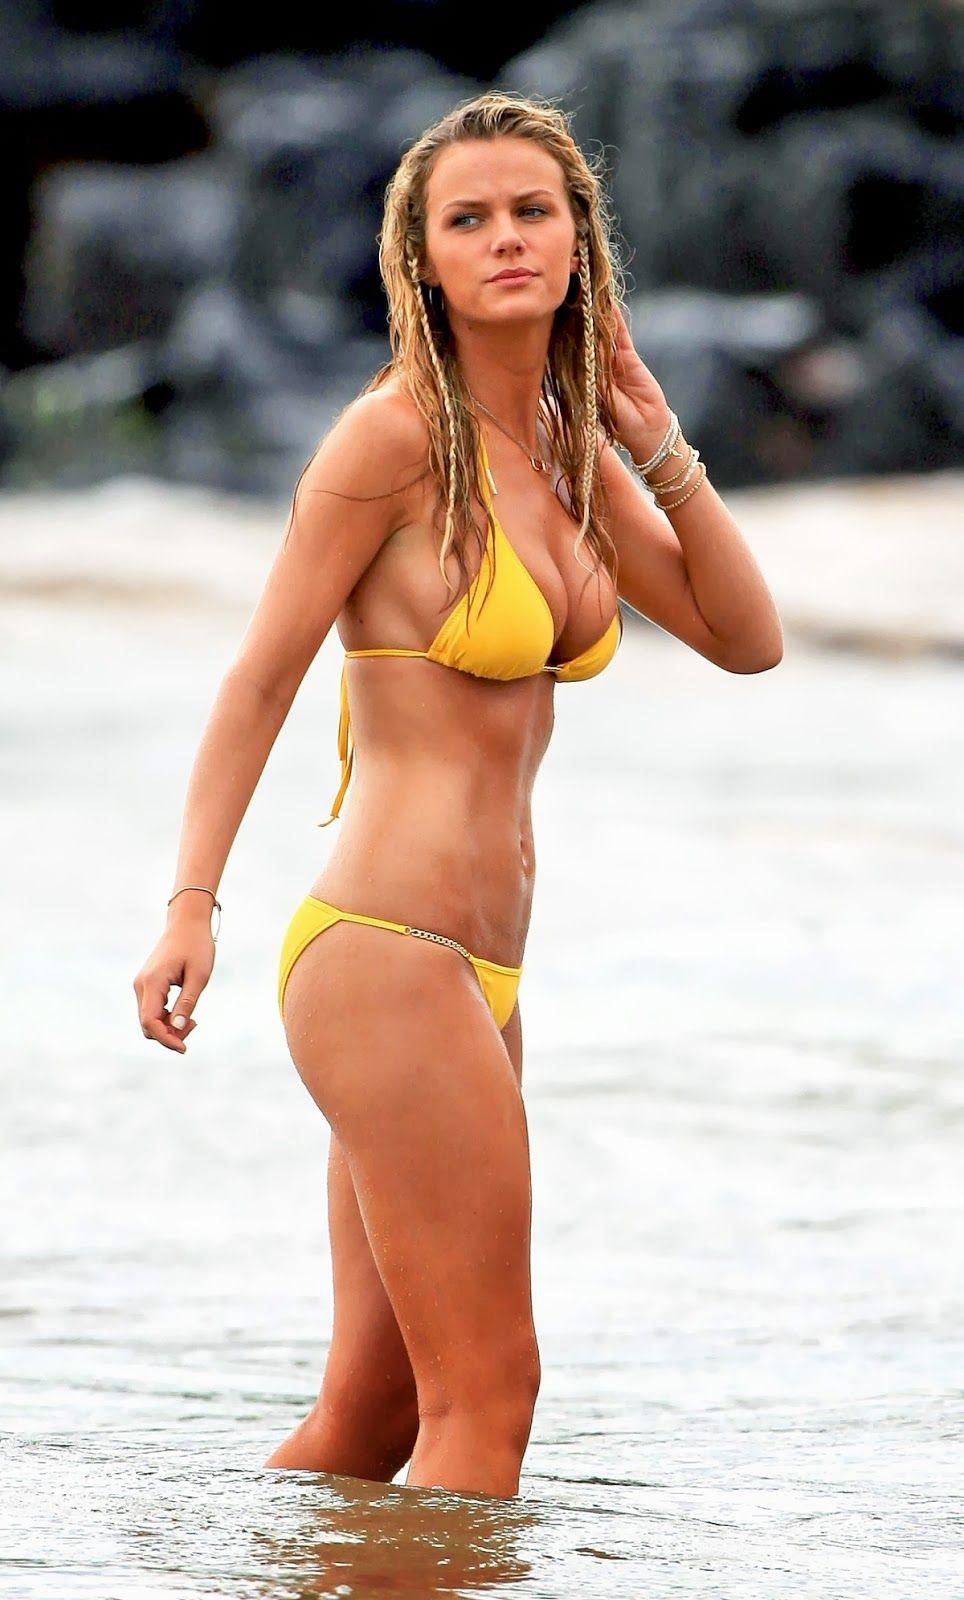 100 Images of Amber Heard Bikini